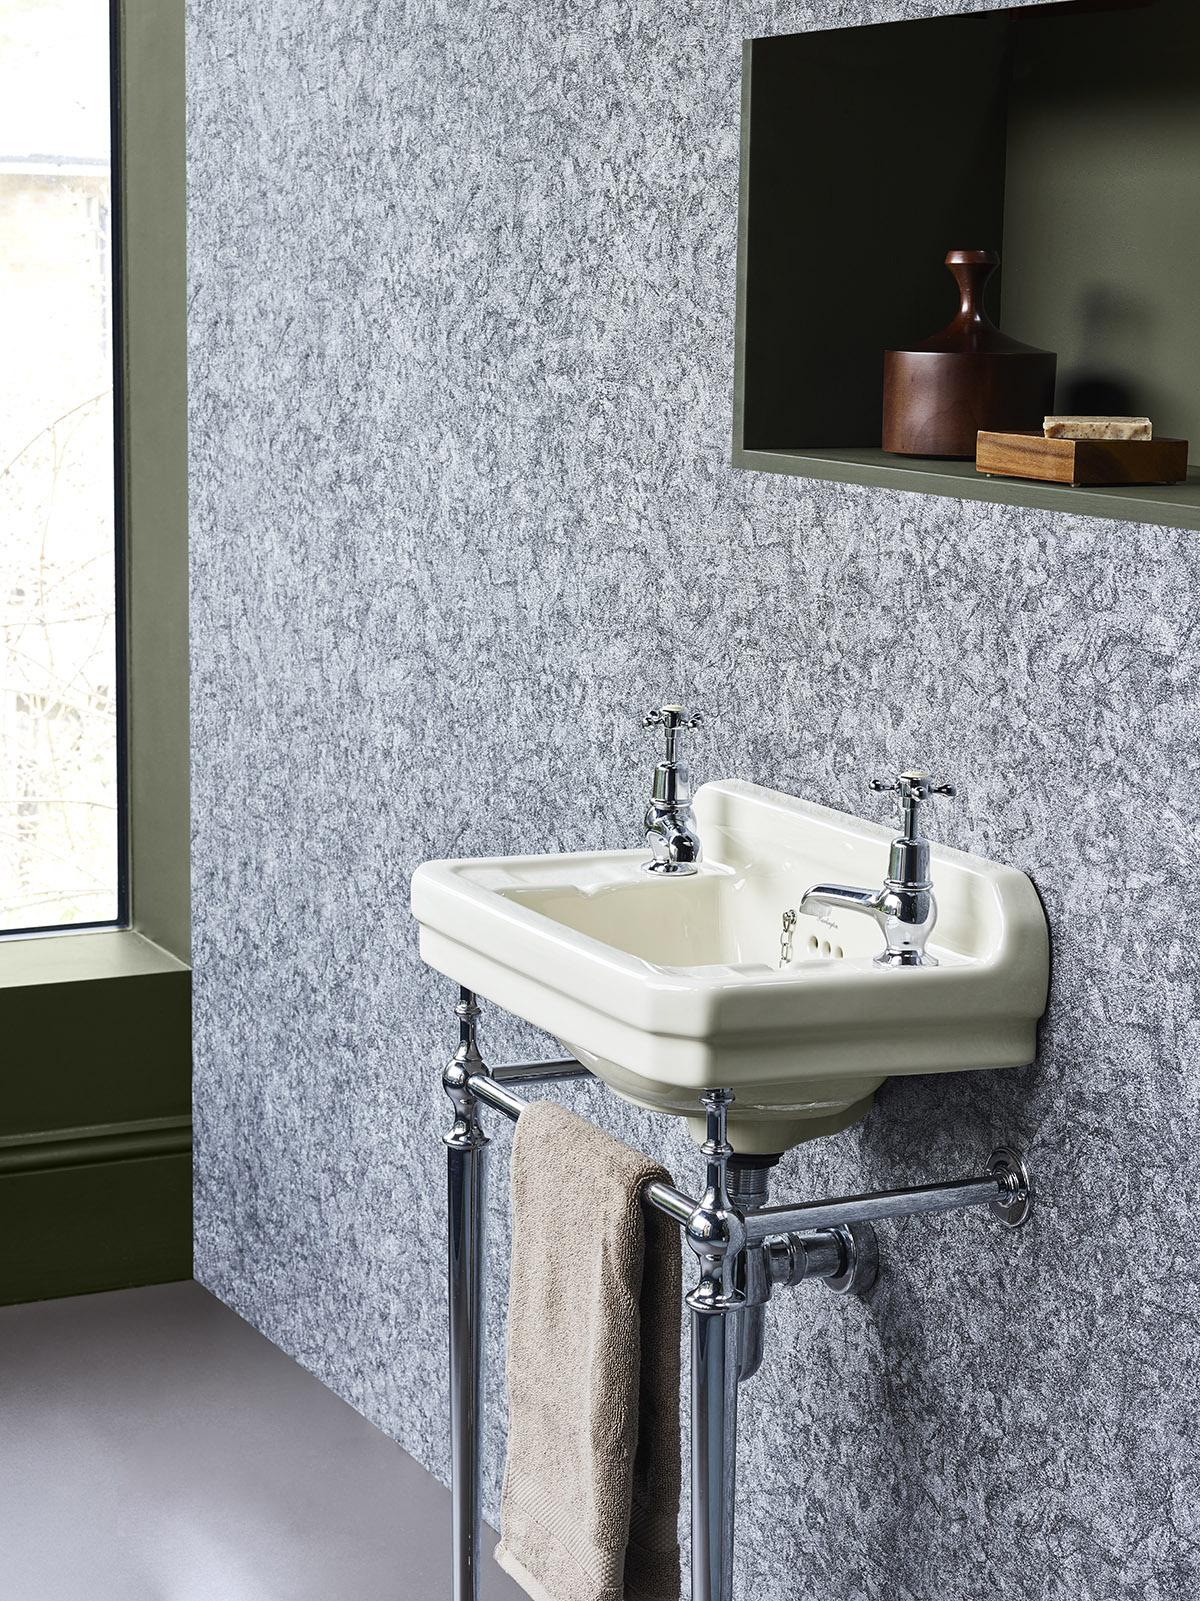 Medici ivory basin and chrome wash stand - Burlington Bathrooms 1200px.jpg